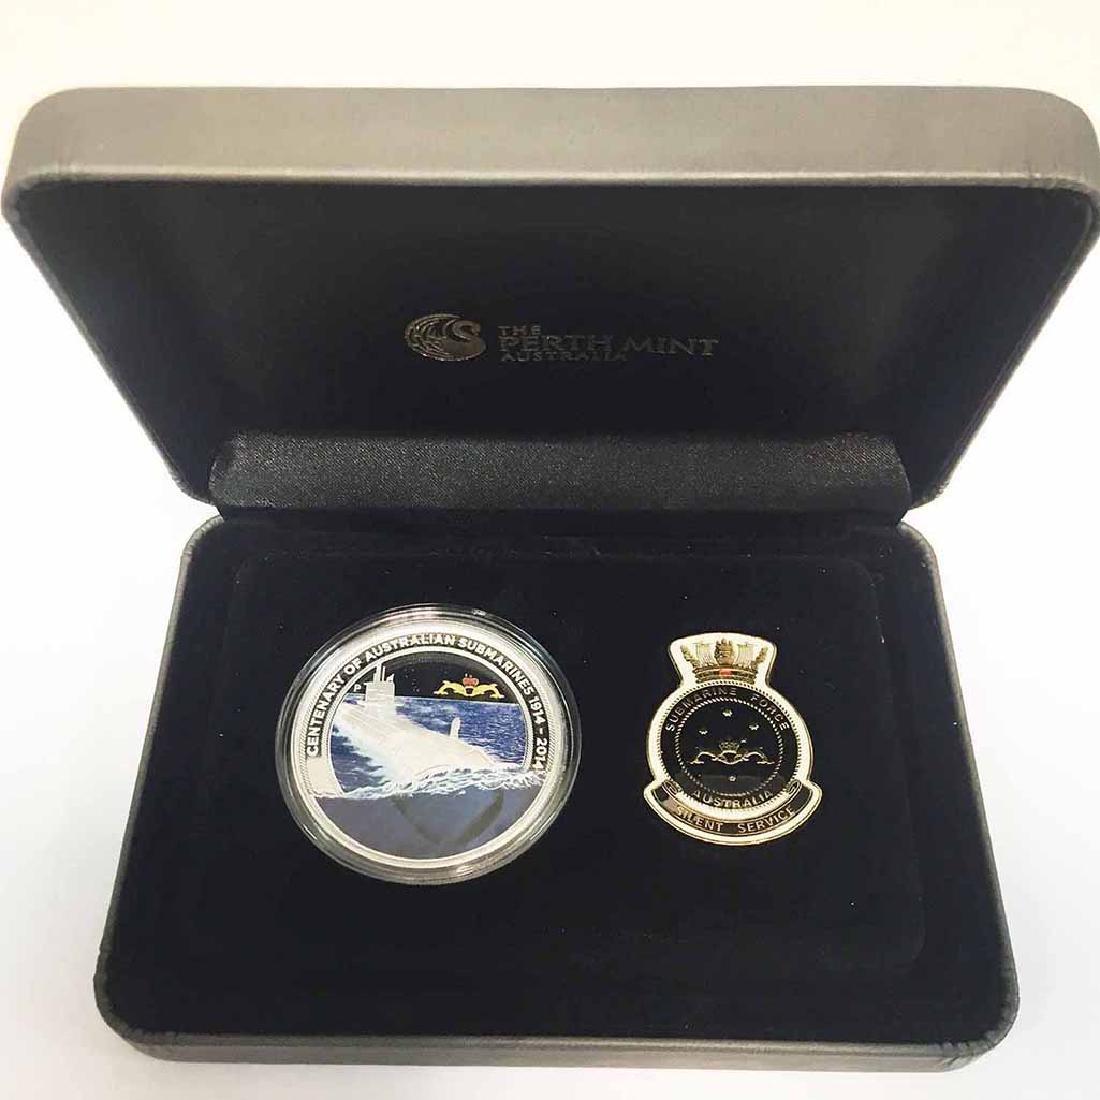 Australia $1 2014 1 oz. silver Submarine Service Centen